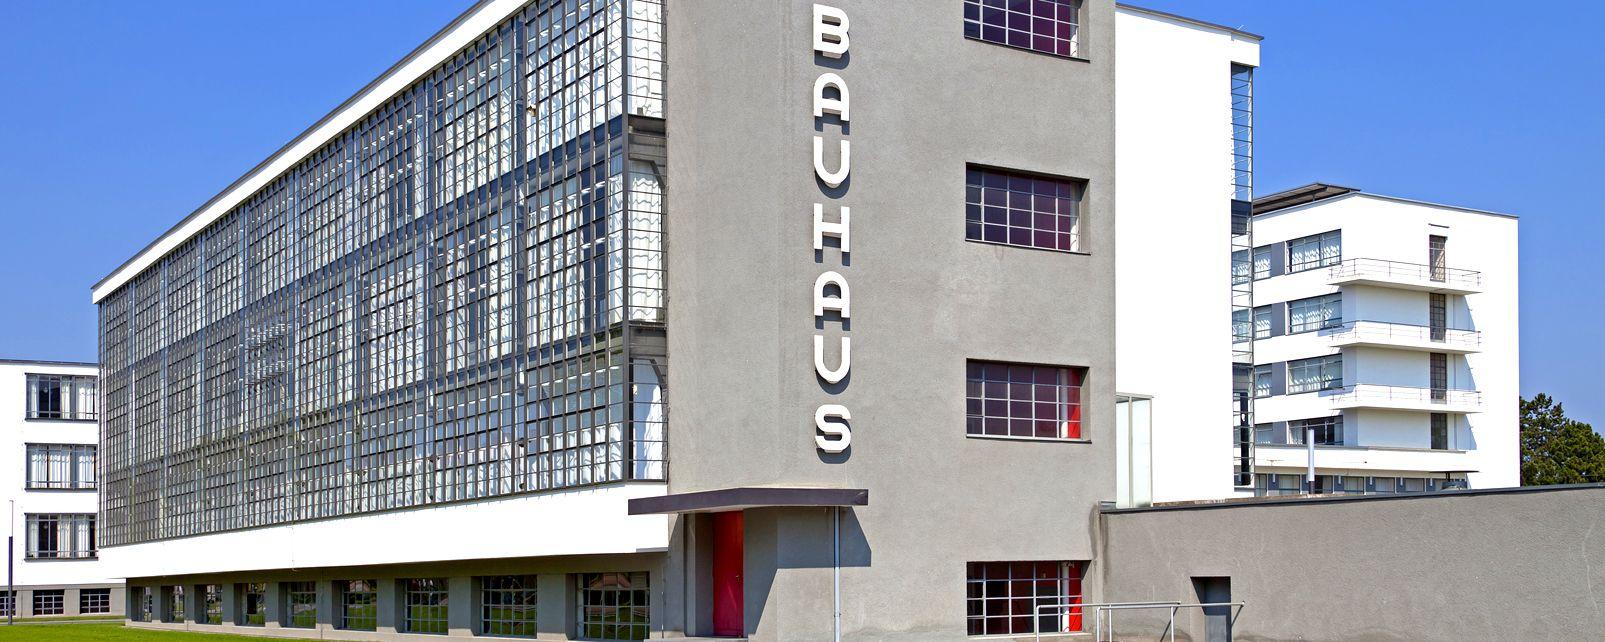 La bauhaus germania for Bauhaus berlin edificio